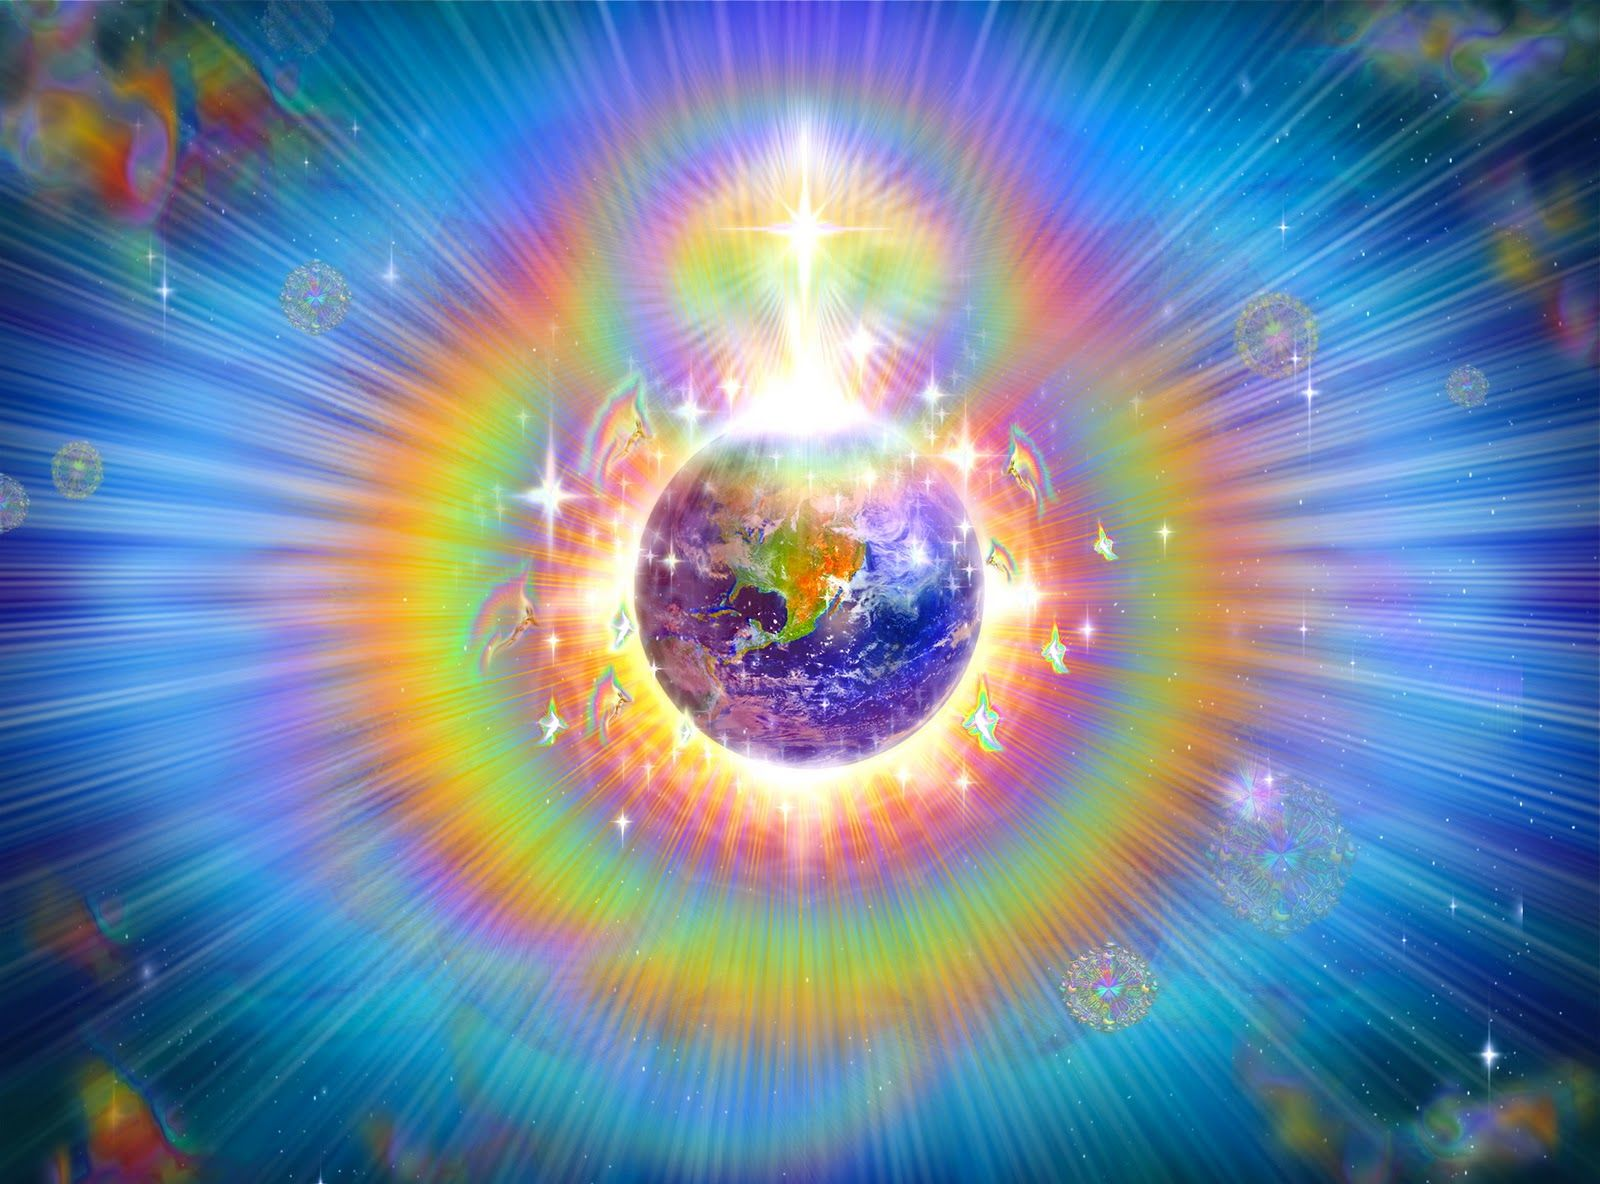 The Rainbow Light Body and the Rose Merkaba: Emerging into Infinity | Earth  Hive on WordPress.com | New earth, Spirituality, Earth